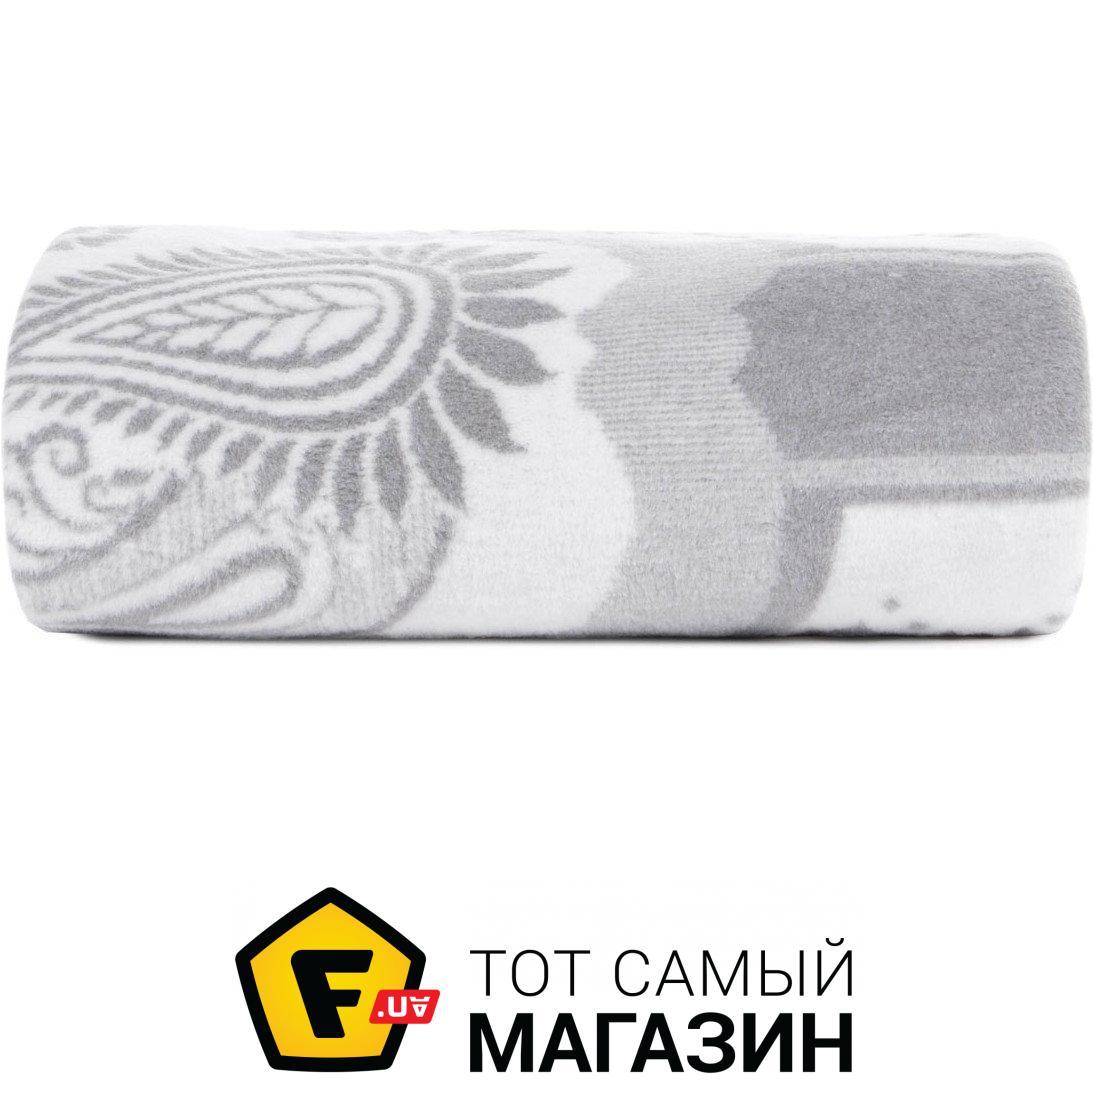 Плед Arya Бавовна 200X220 Poet (TR1005042) Размеры одеяла покрывала  220 x  200 88985308e8b5c